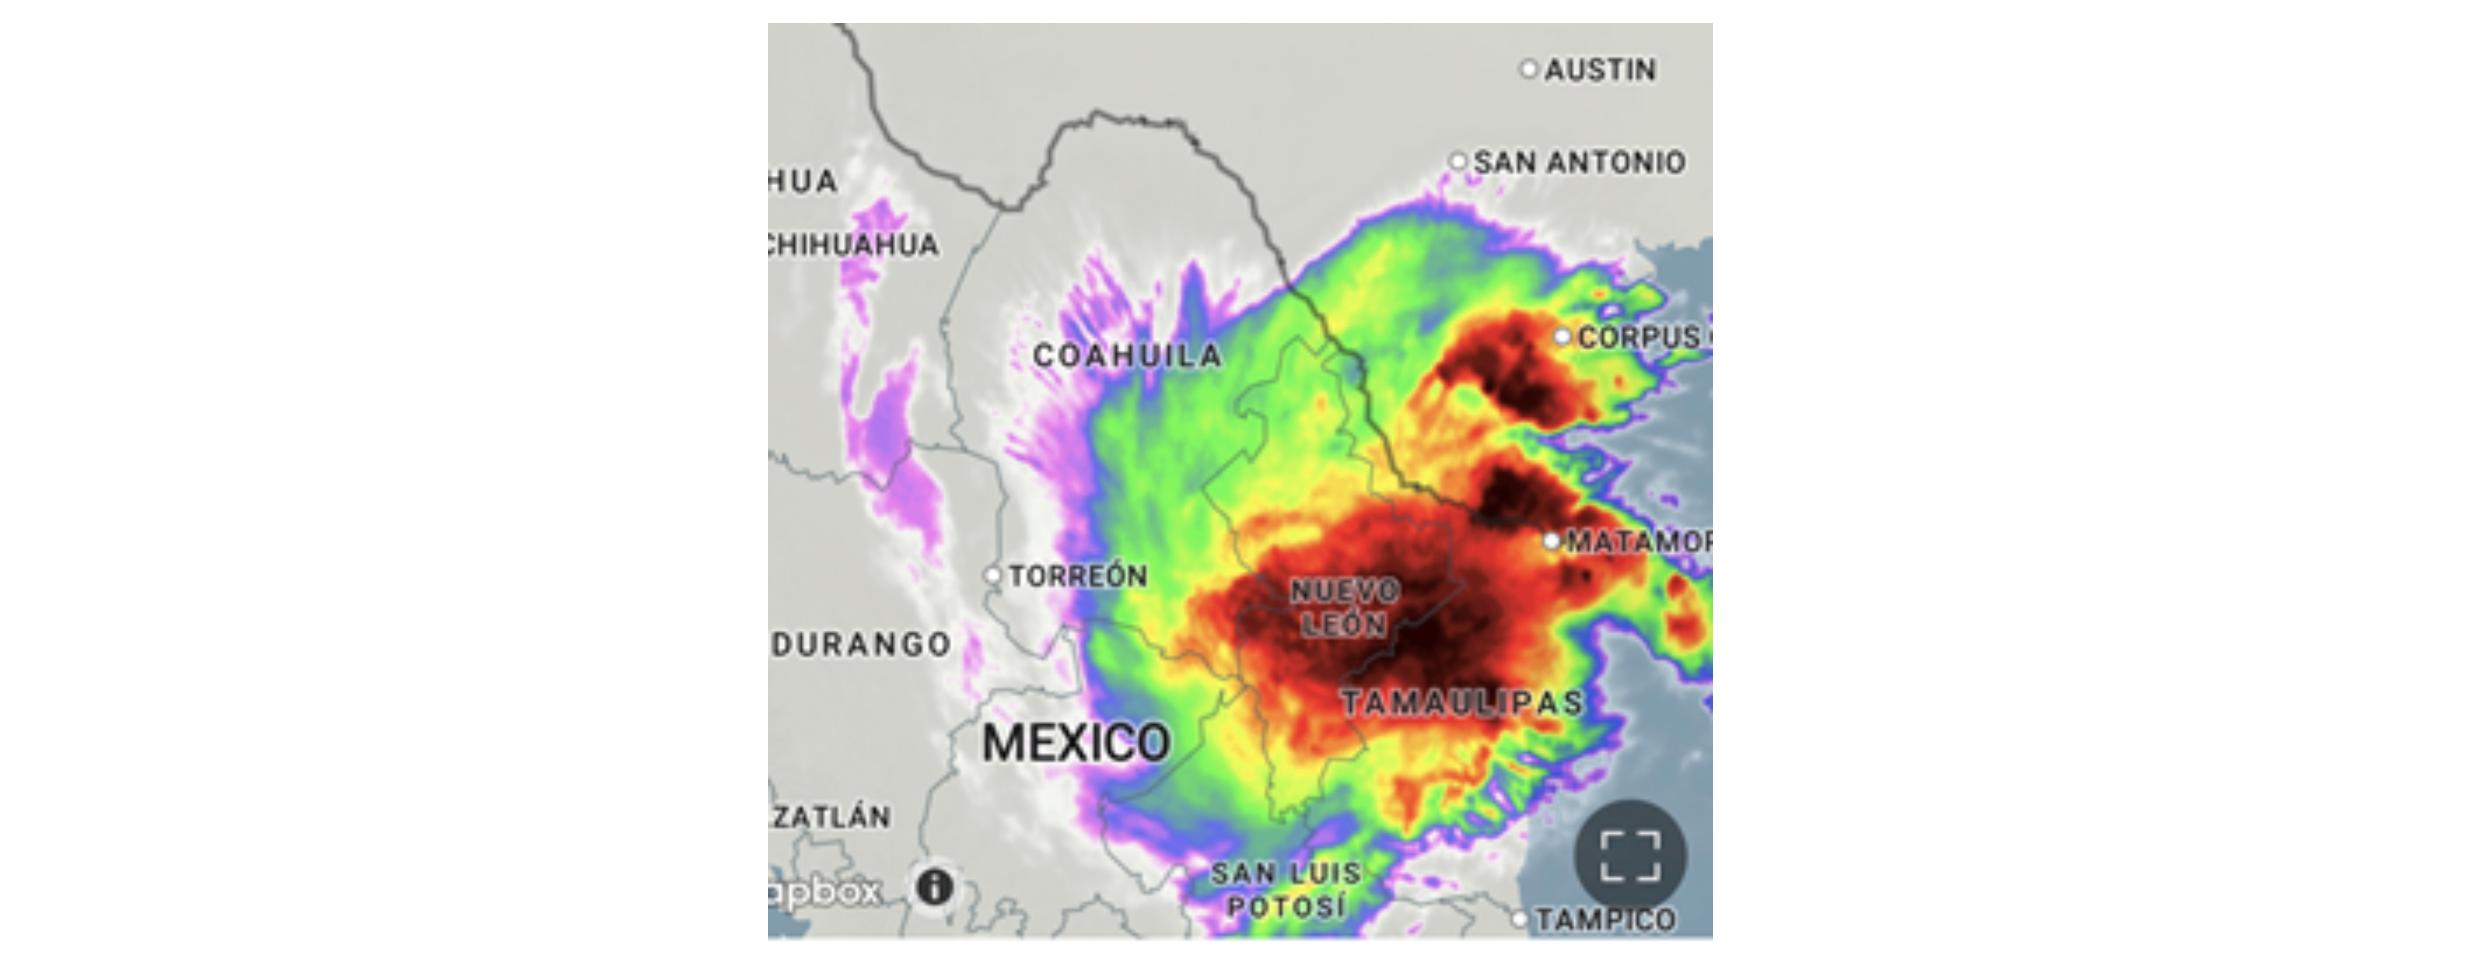 radar image of large rain storm over Monterrey Mexico